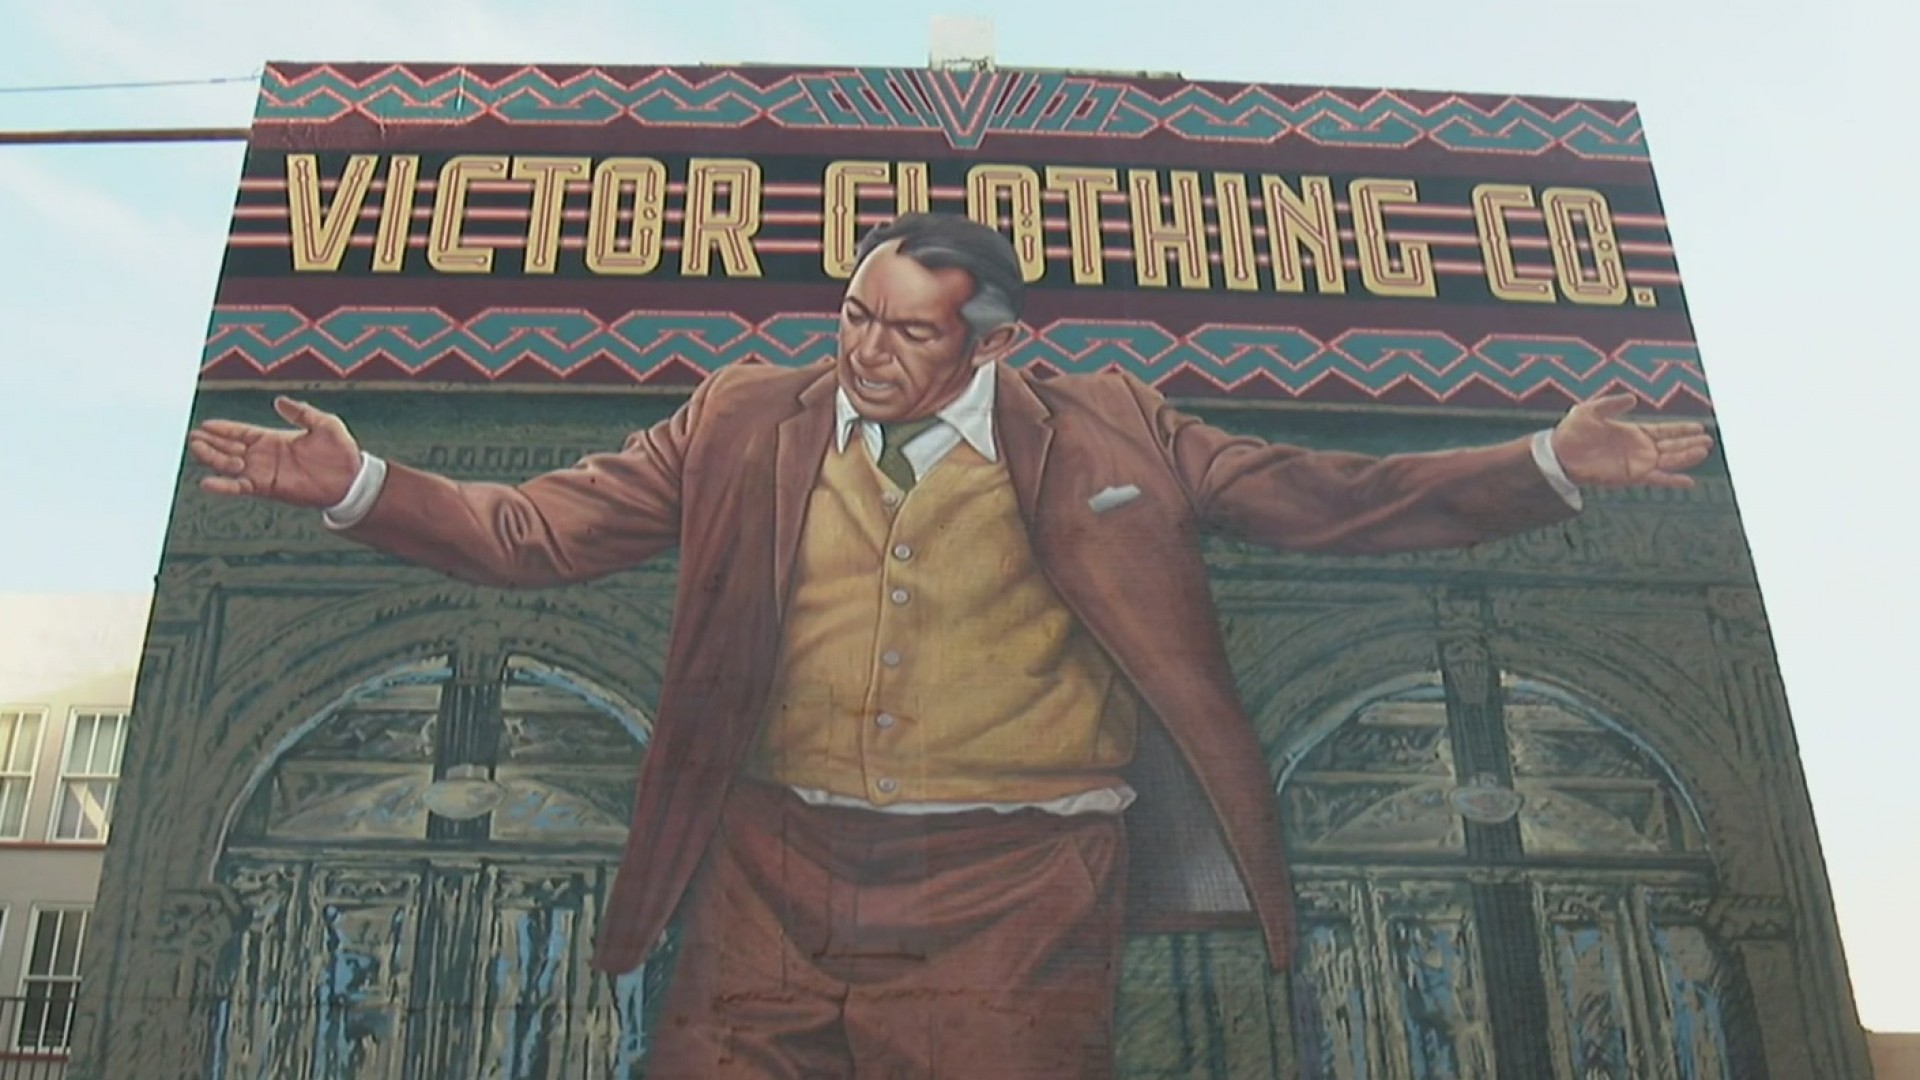 Celebran restauraci n del mural de anthony quinn en el for Anthony quinn mural